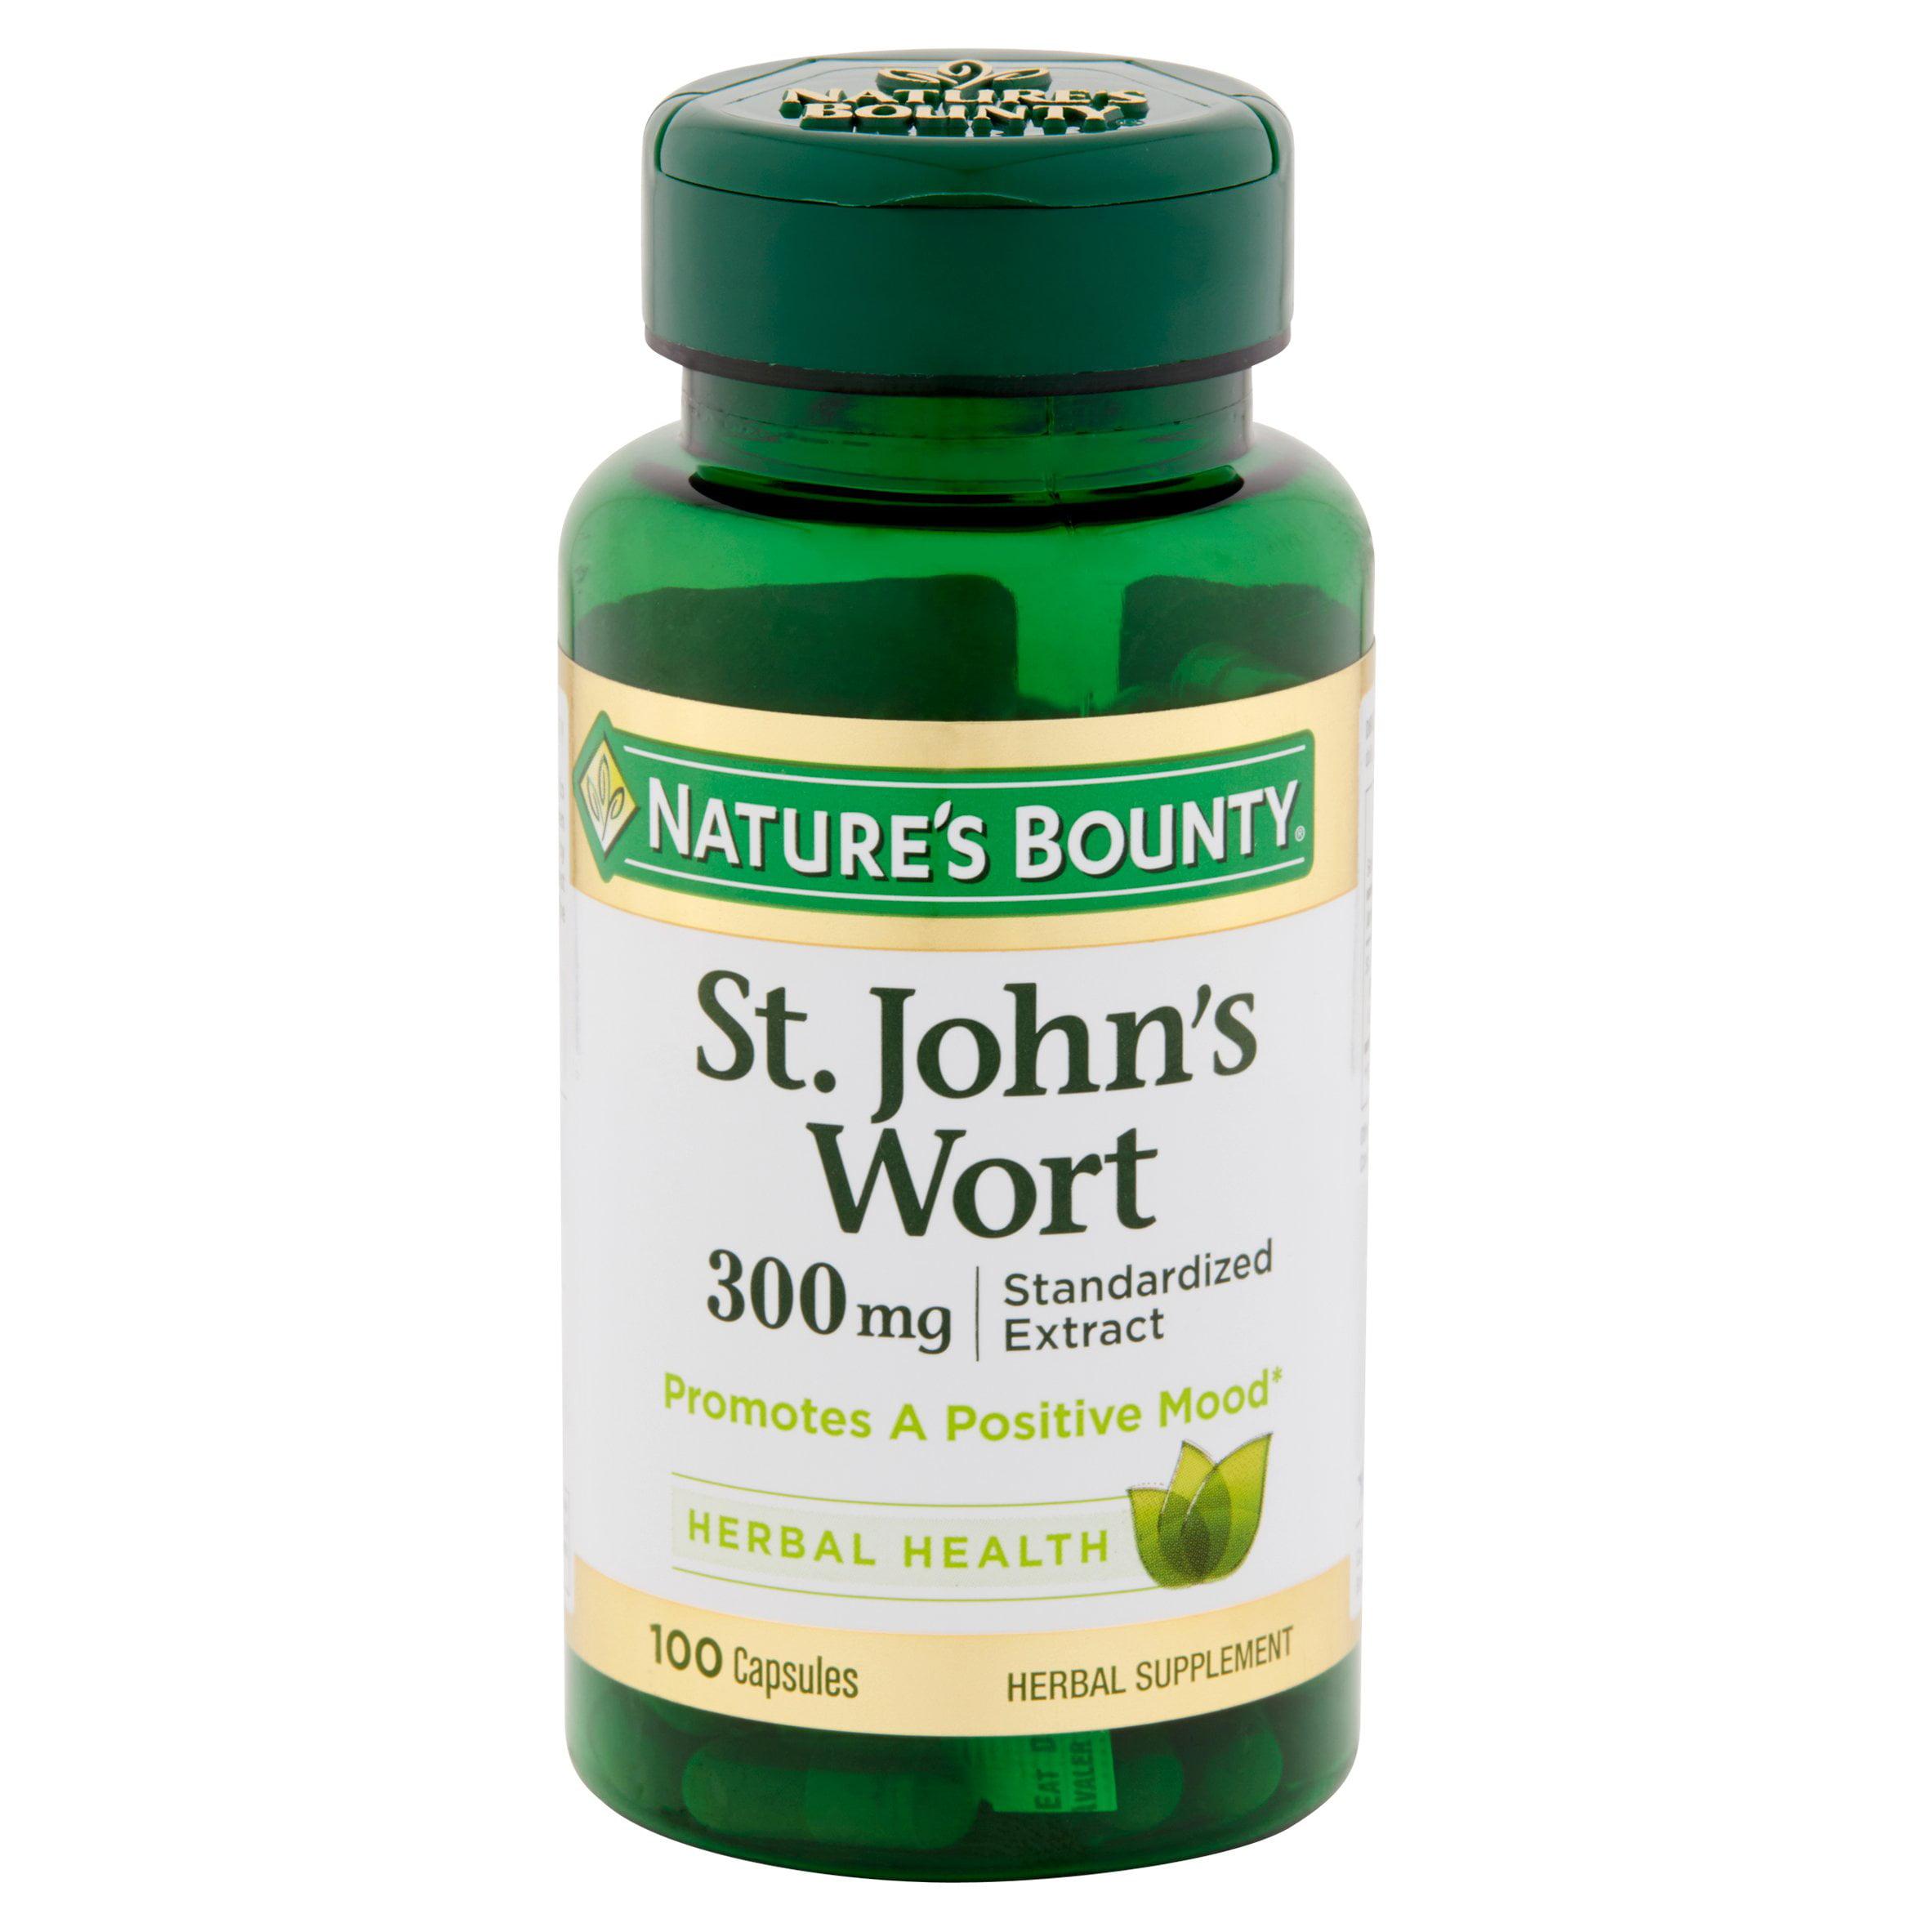 Nature's Bounty St. John's Wort Herbal Health Capsules, 300 mg, 100 count